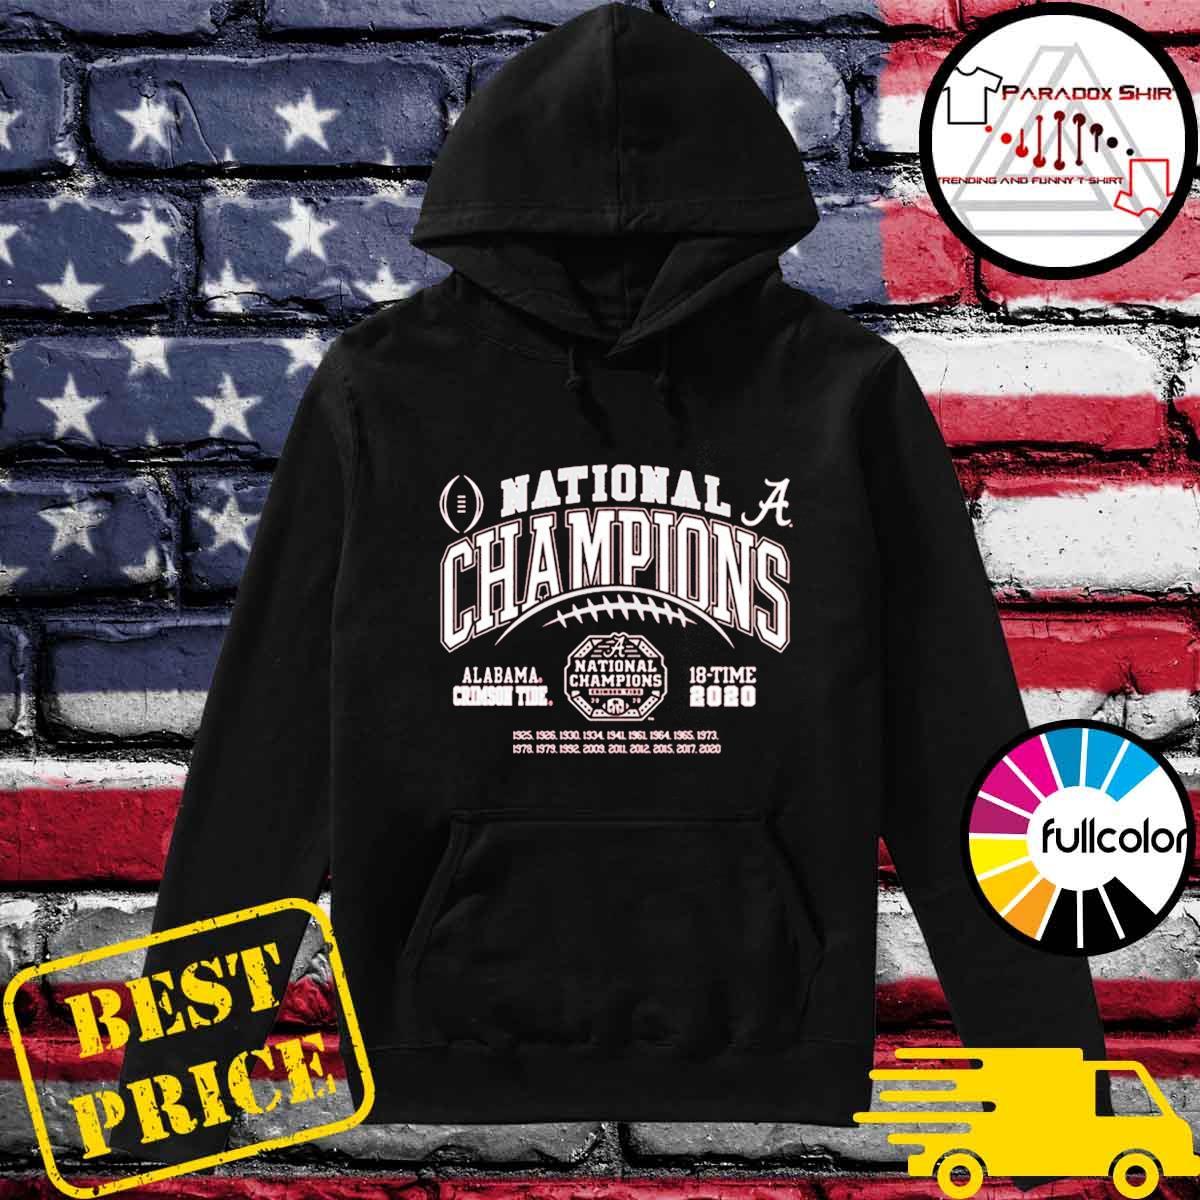 Alabama Crimson Tide National Champs 2020-2021 T-Shirt Hoodie